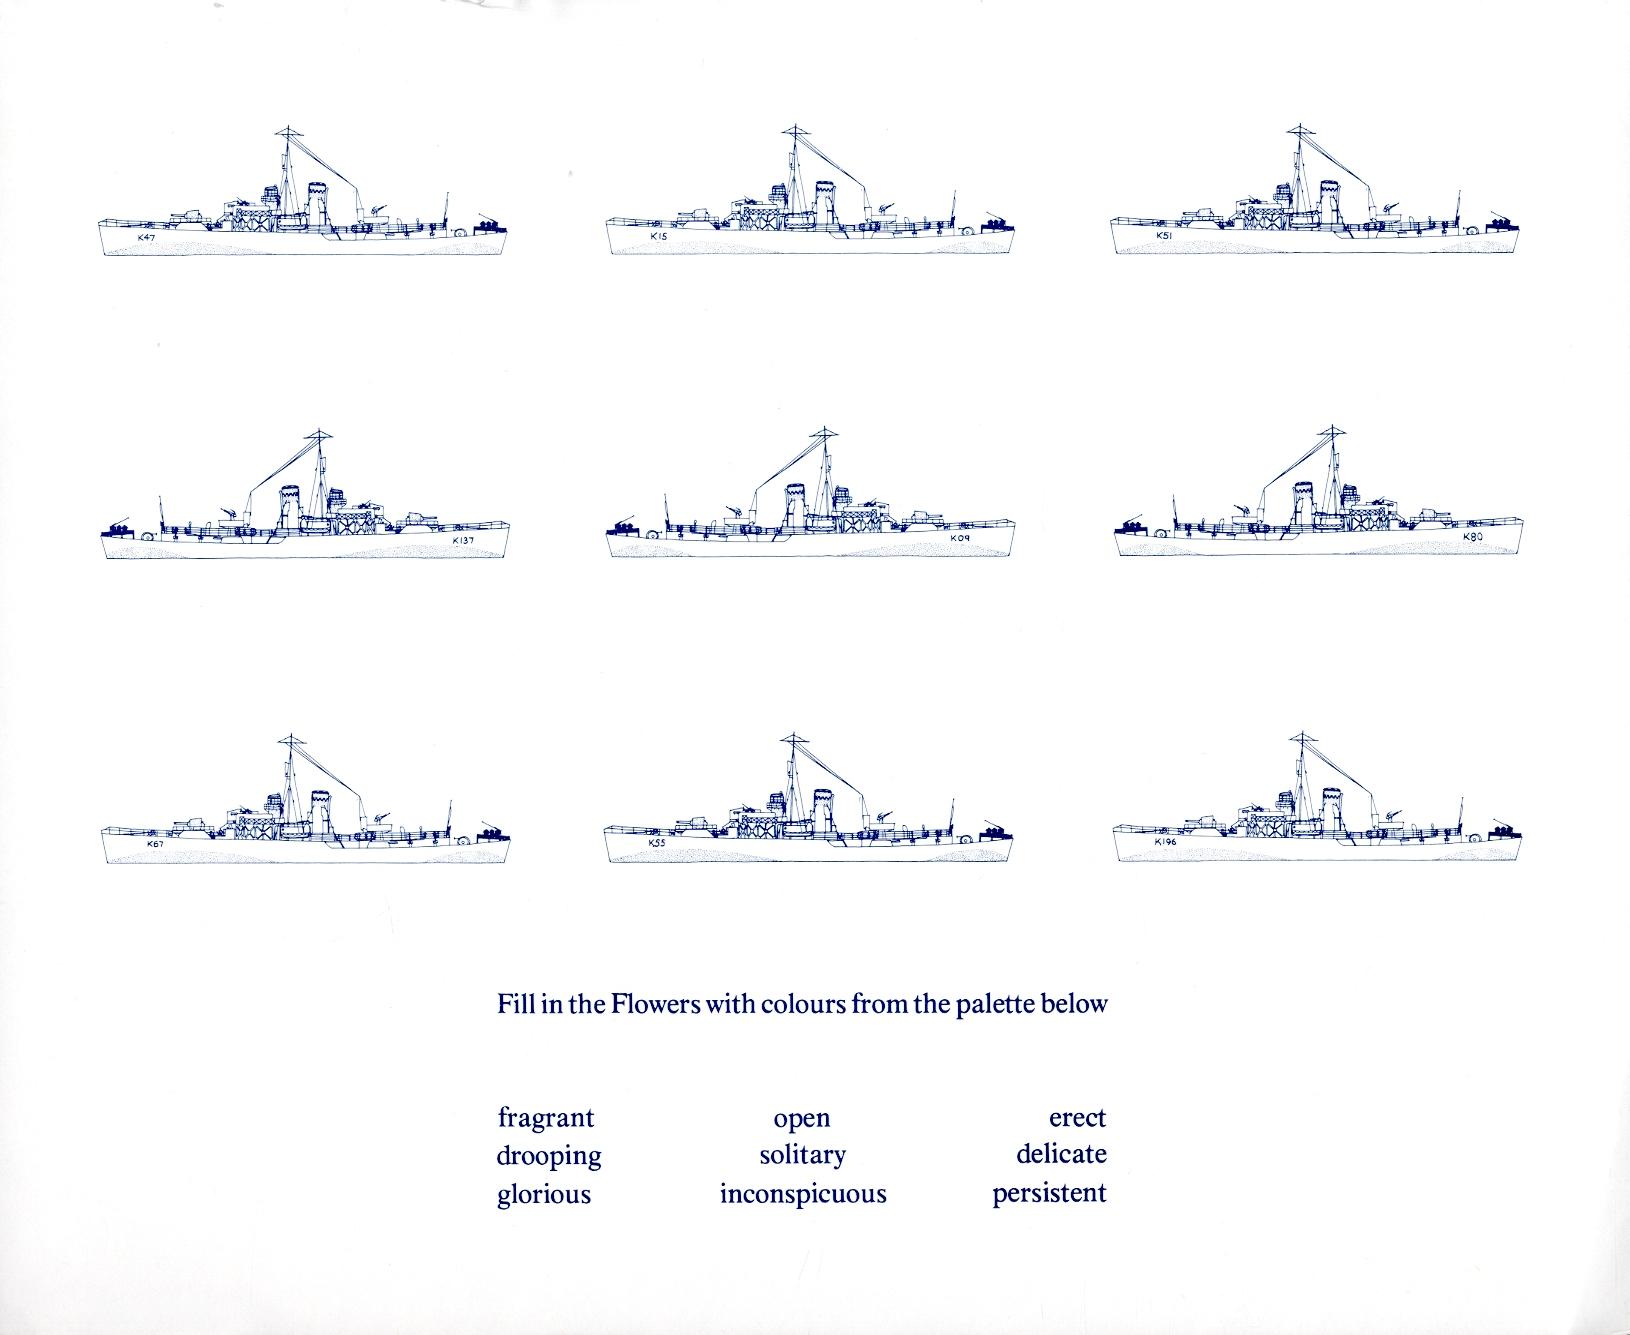 K47, Polyanthus; K15, Heartsease, ex-pansy; K51, Rockrose; K137, Pink; K09, Candytuft; K80, Bluebell; K67, Snowdrop; K55, Periwinkle; K196, Cowslip - Flower Class corvettes